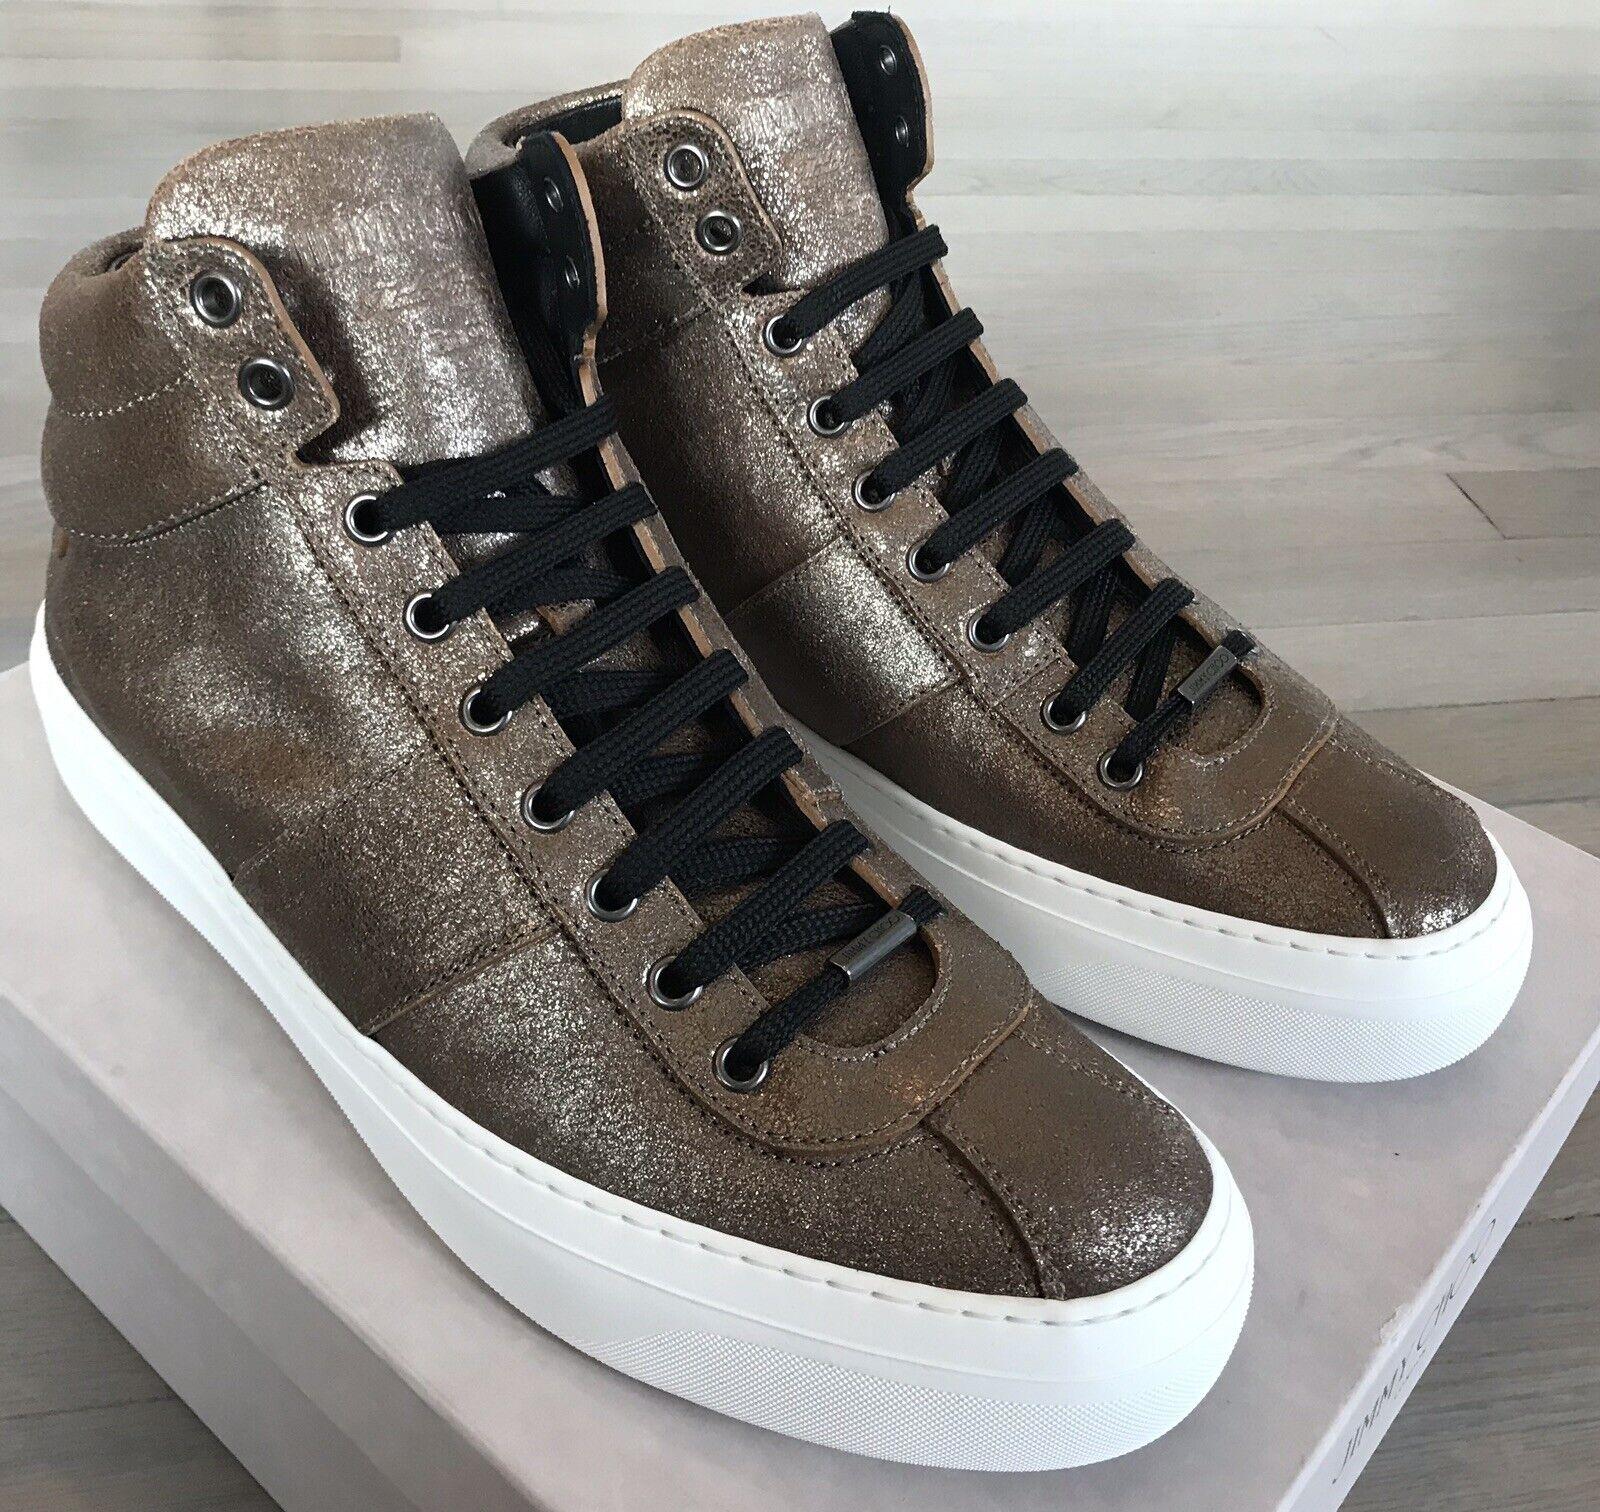 750  Jimmy Choo Belgravi Gunmetal High Tops Sneakers size US 12, Made in